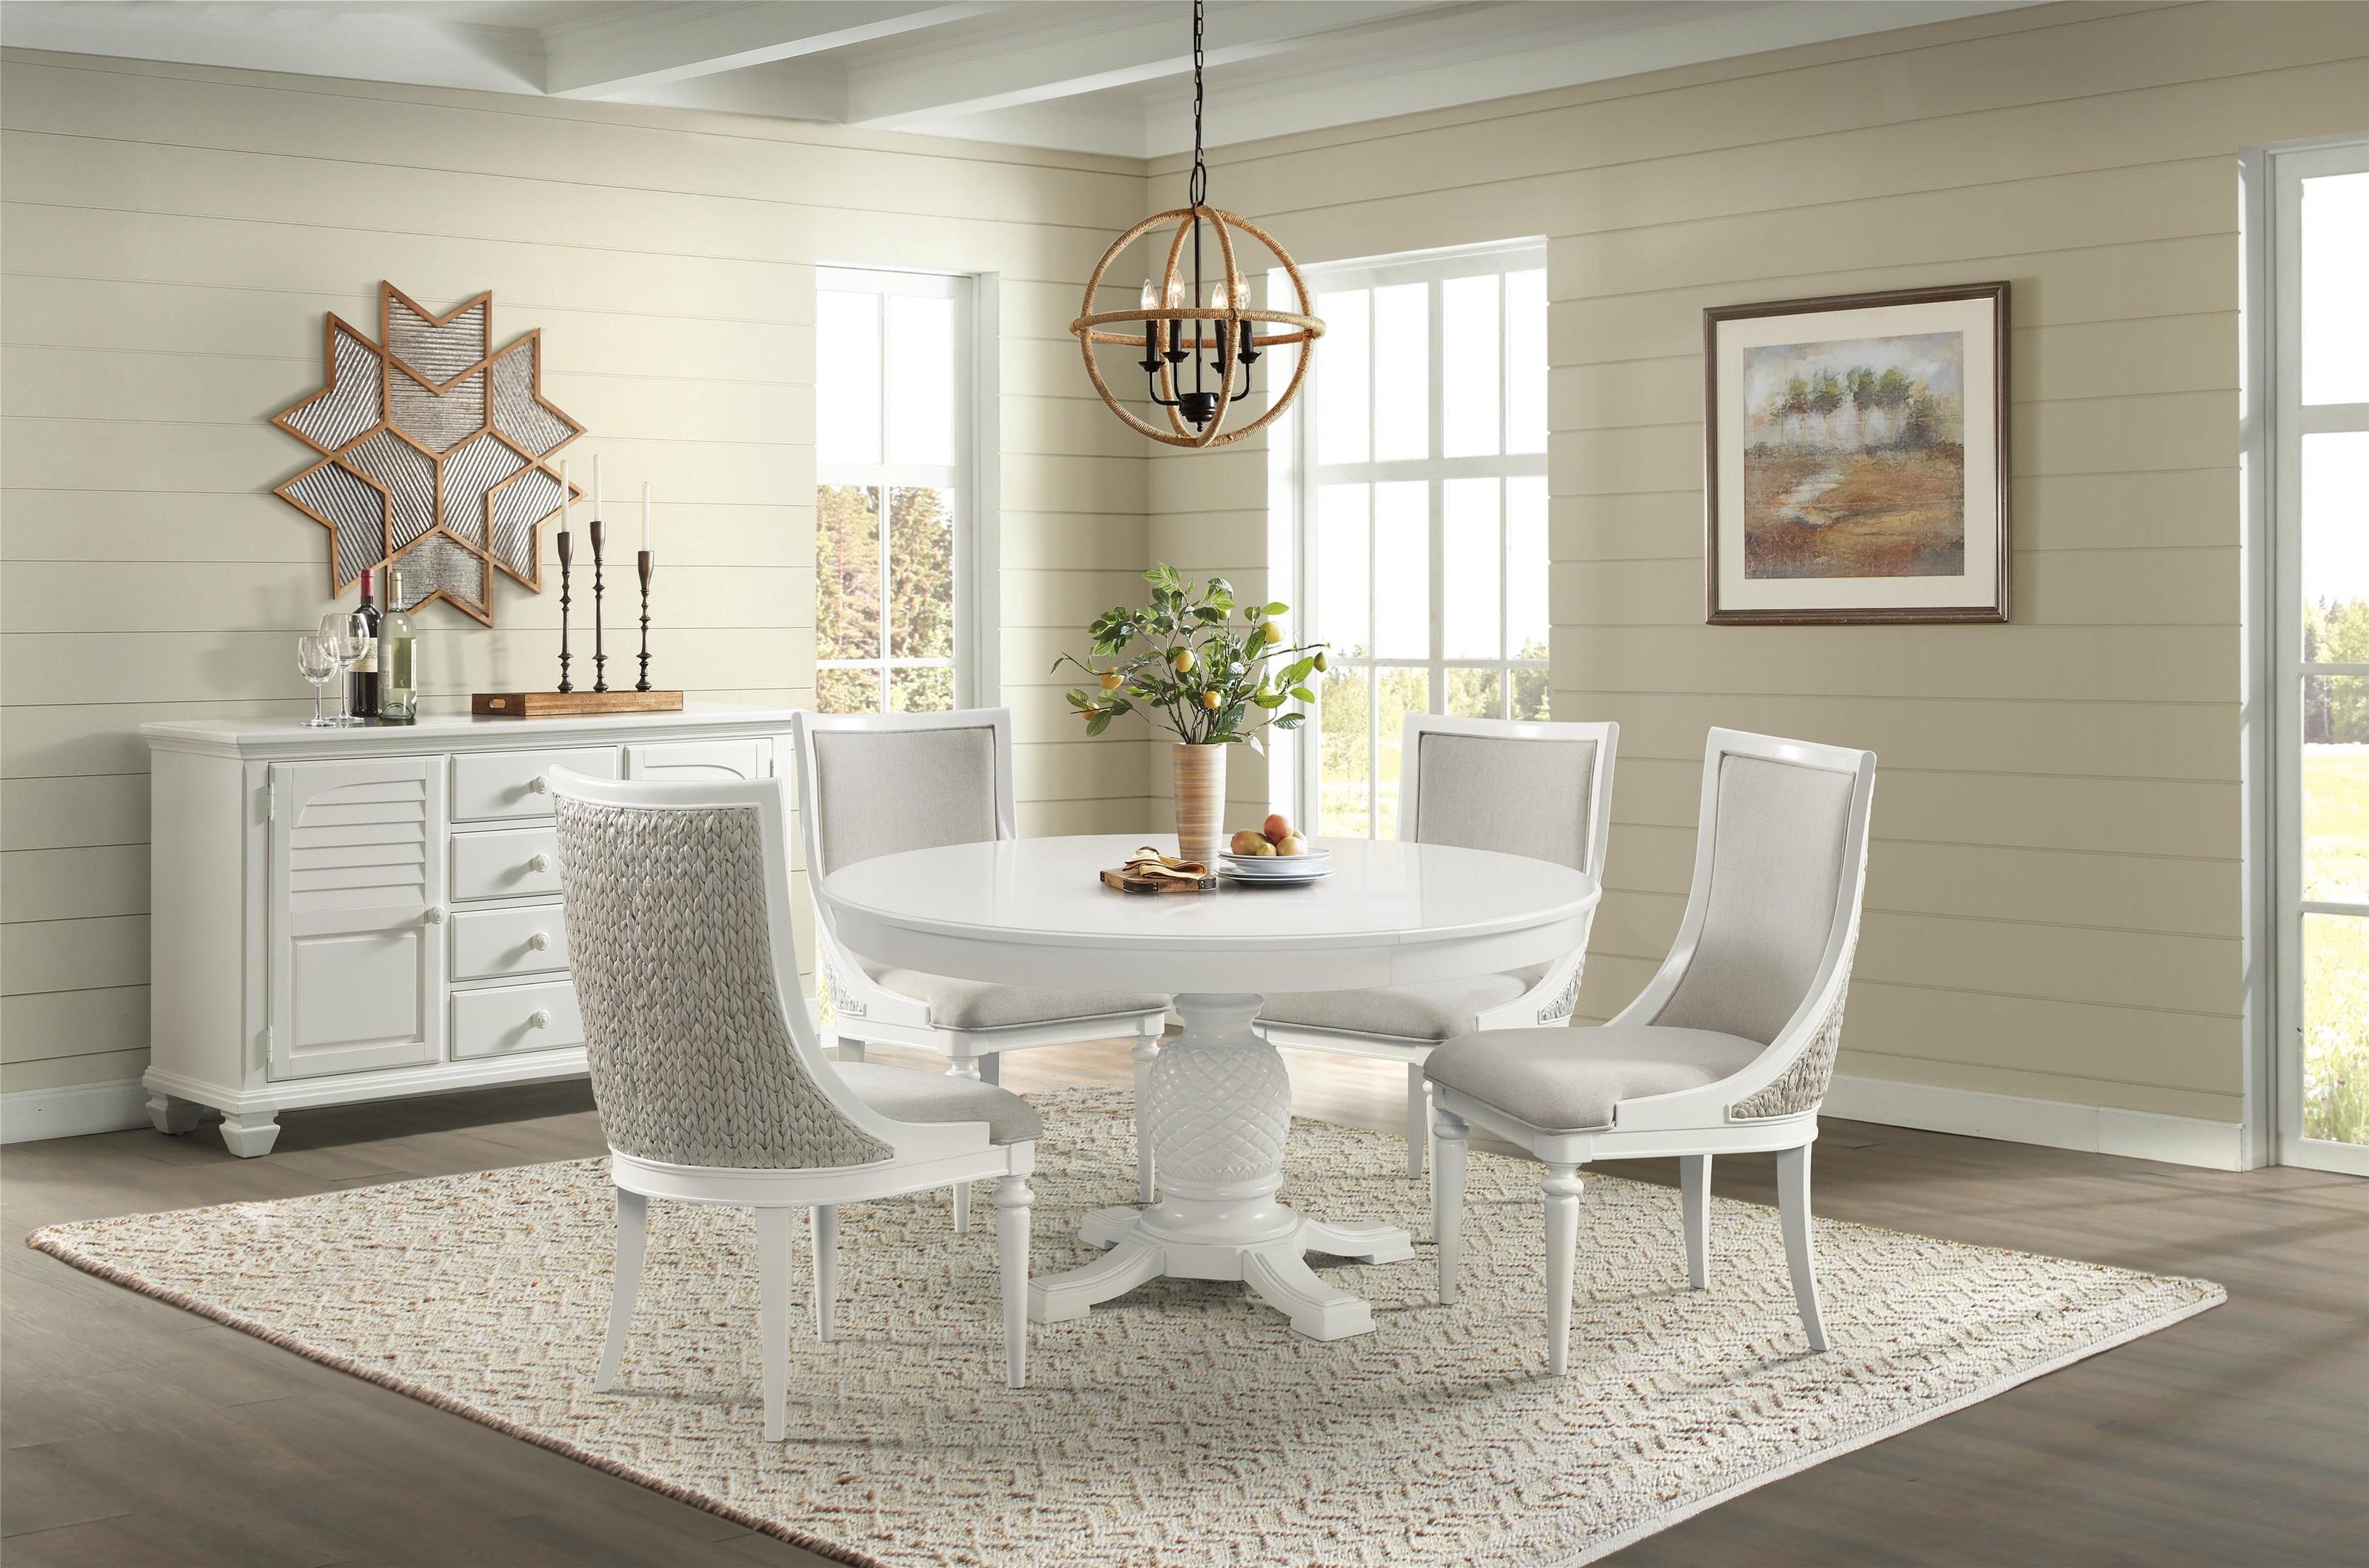 Harbortown Round Pedestal Dining Table by Stillwater Furniture at Baer's Furniture